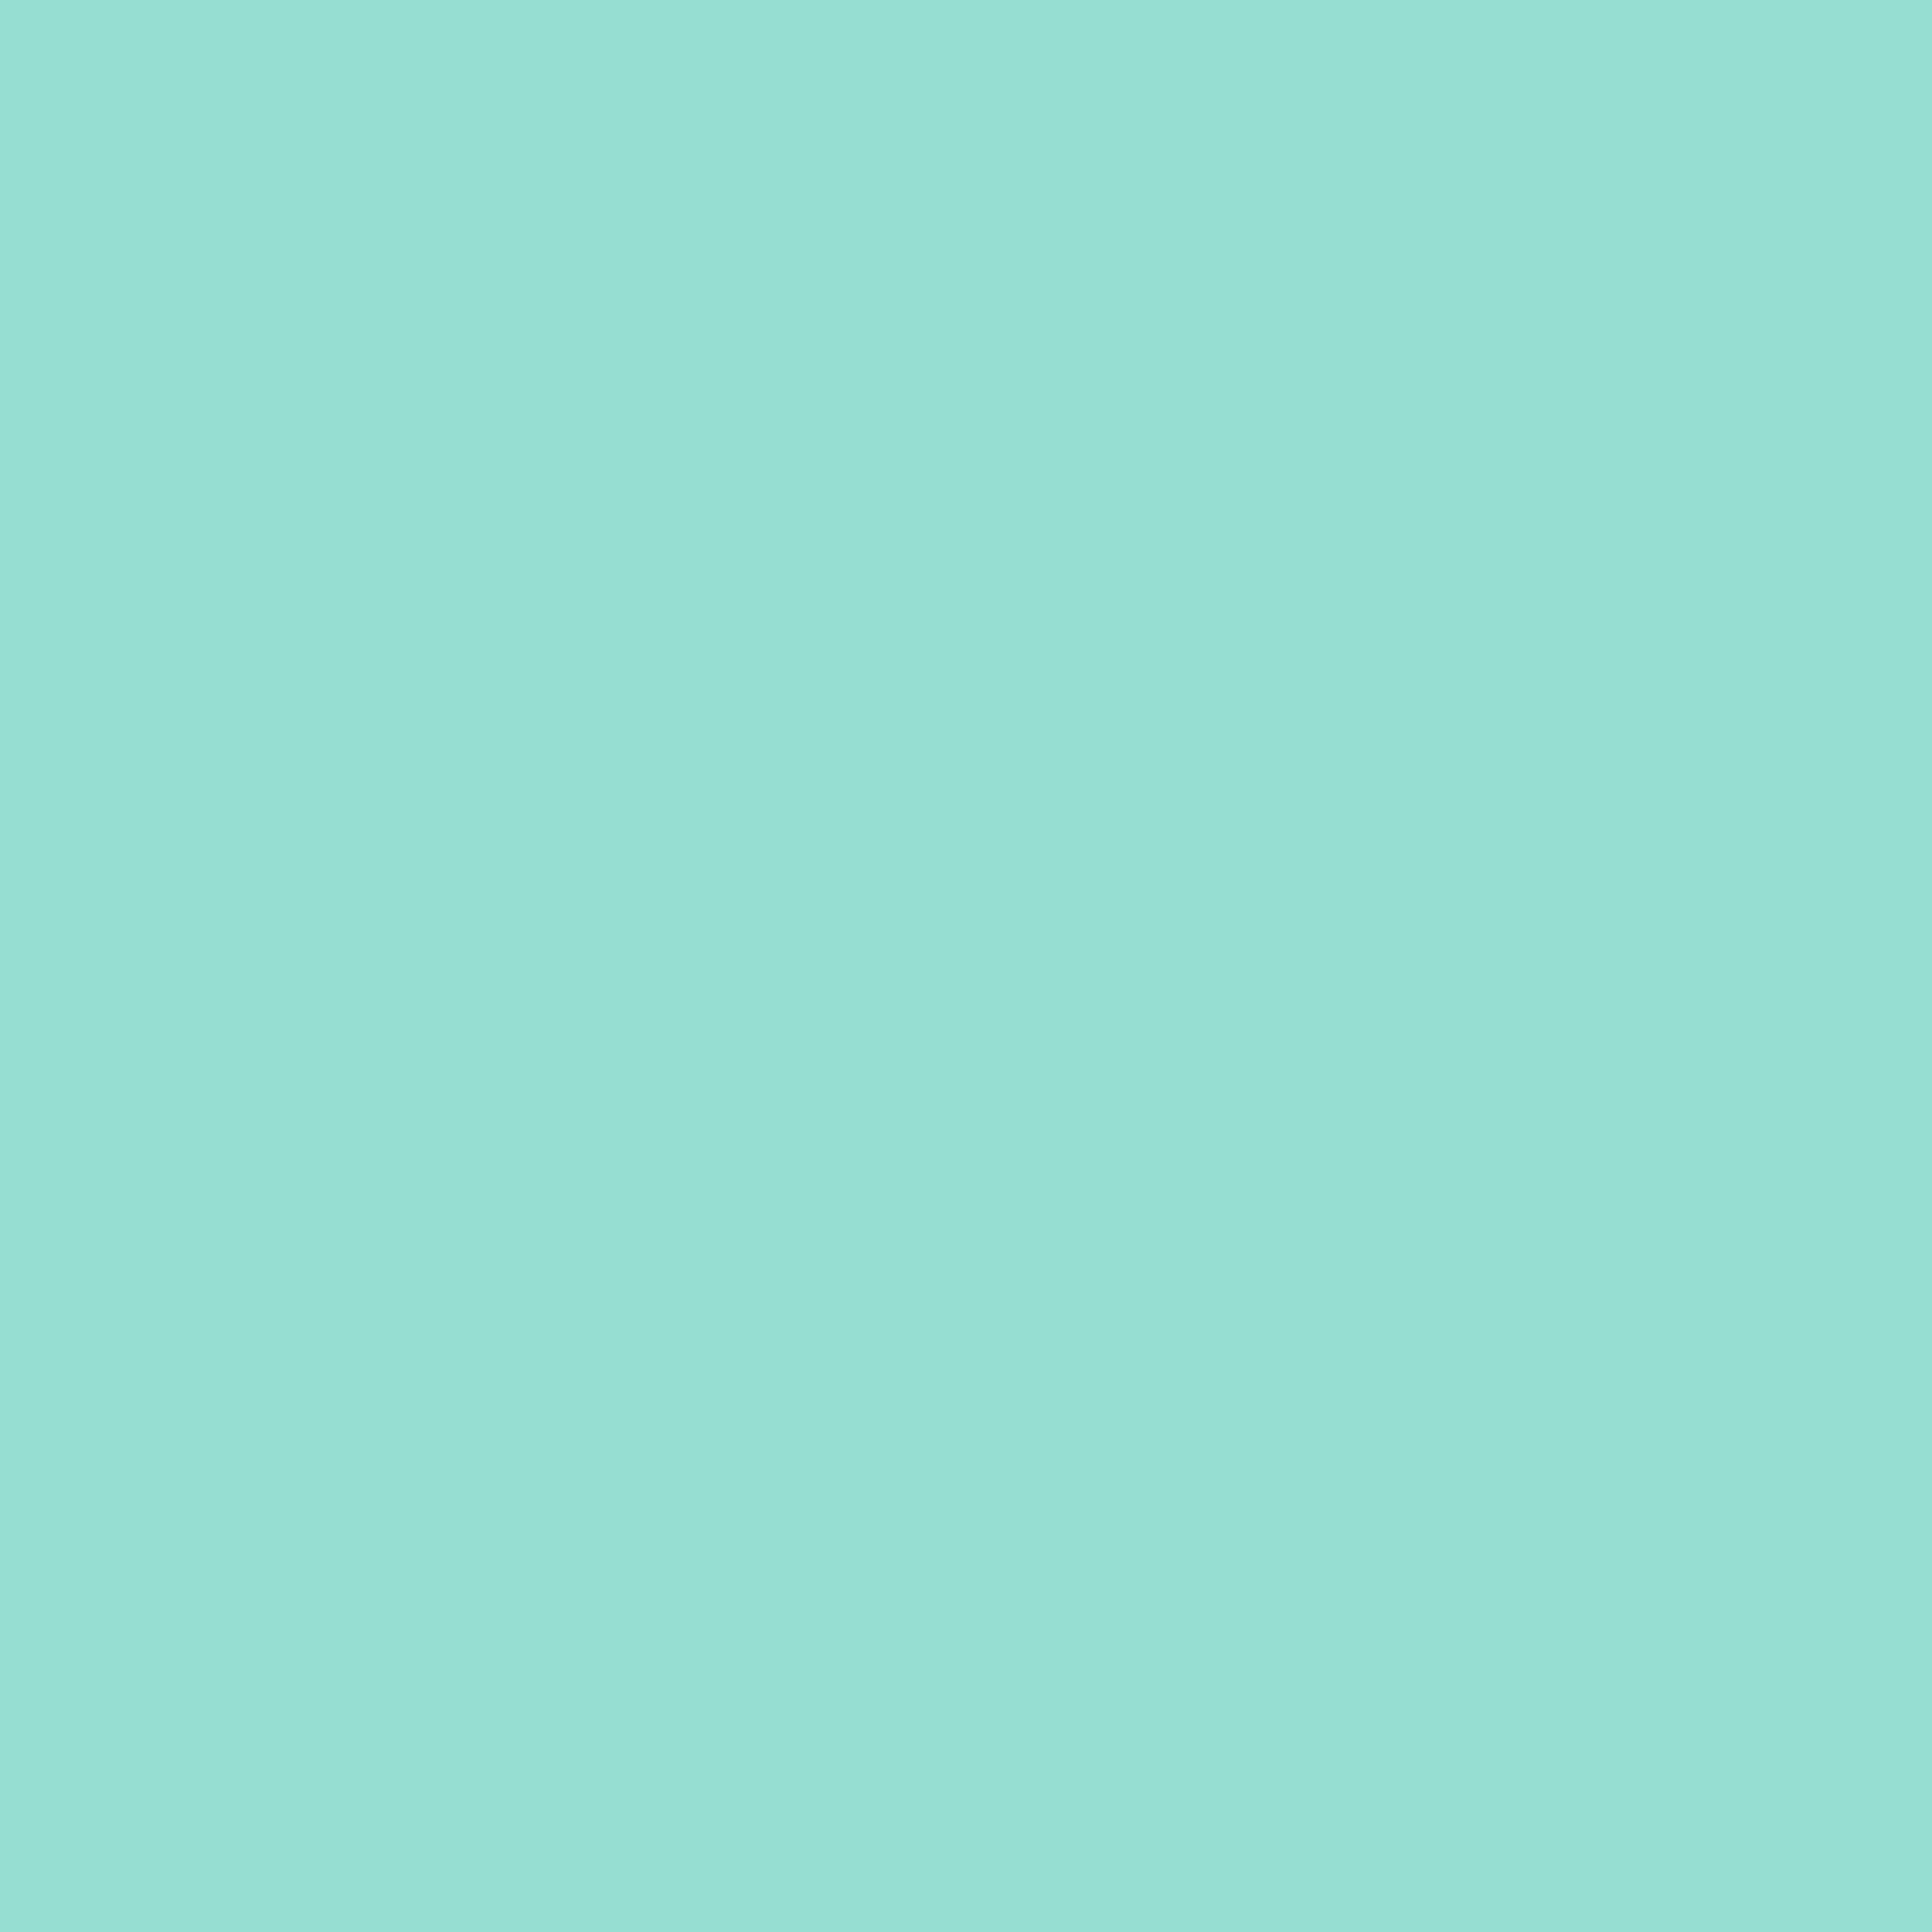 3600x3600 Pale Robin Egg Blue Solid Color Background